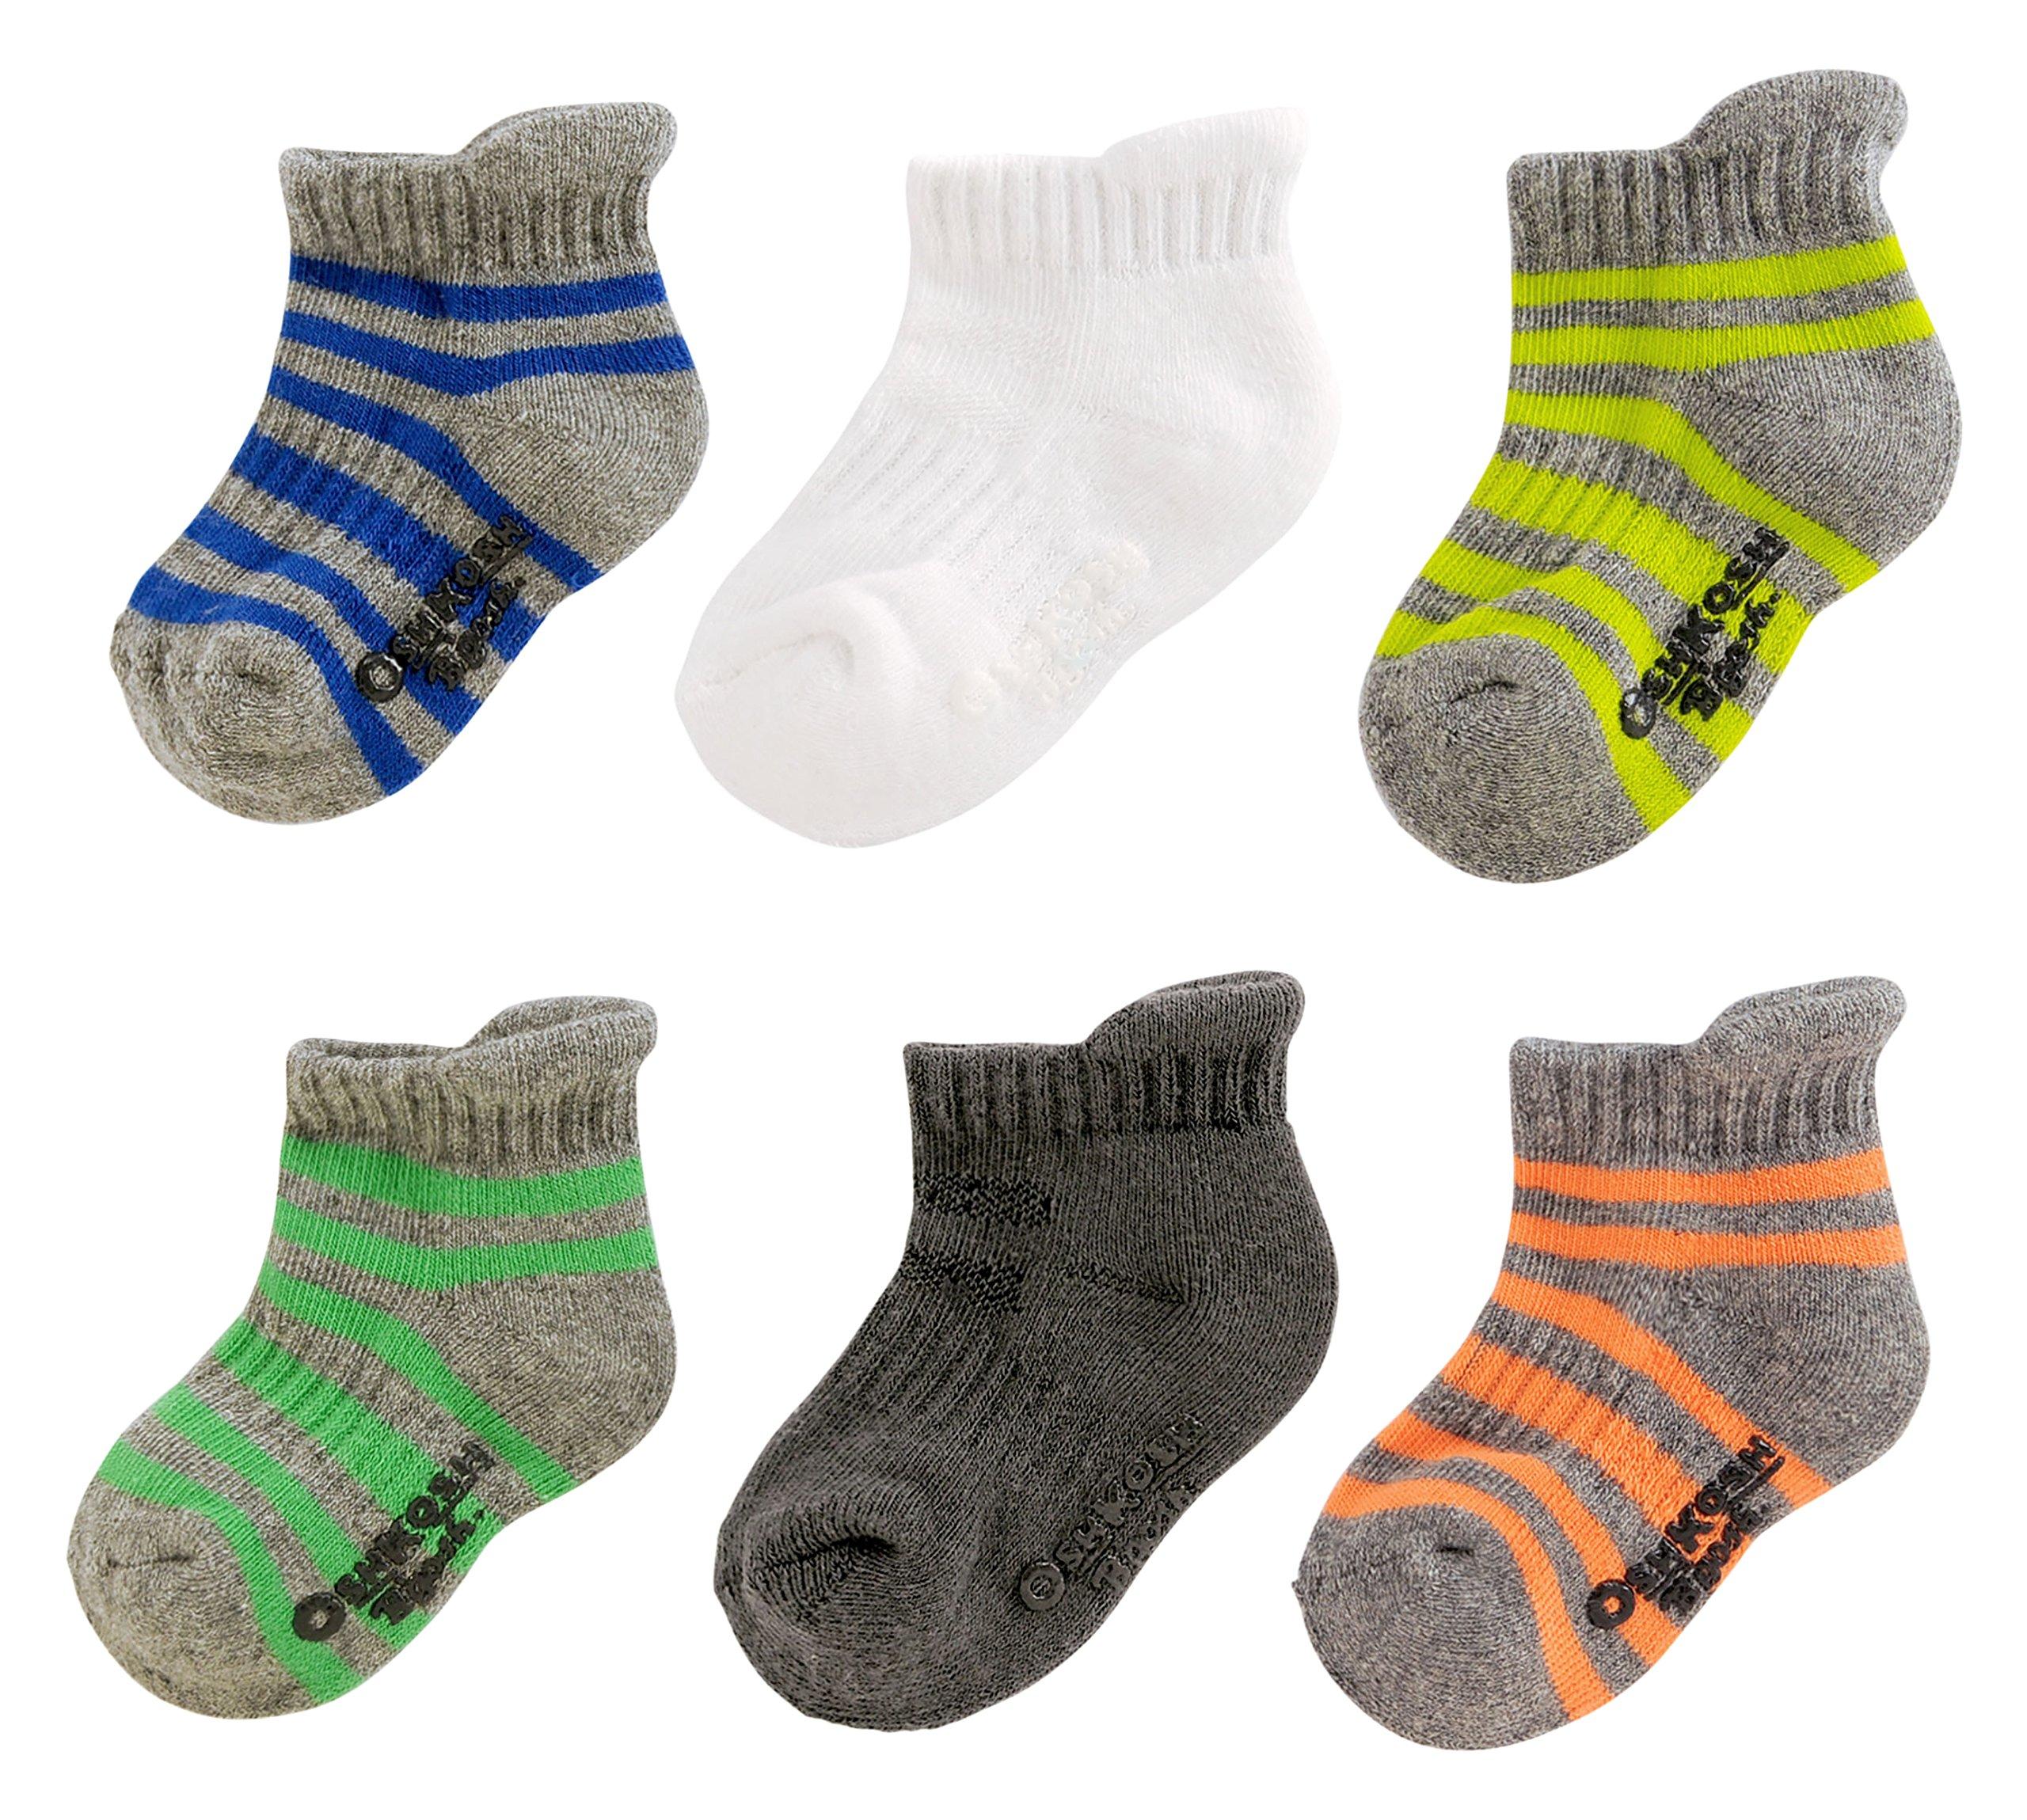 OshKosh B'Gosh Little Boys' Ankle Socks (6 Pack), Athletic Stripe, 8 and up